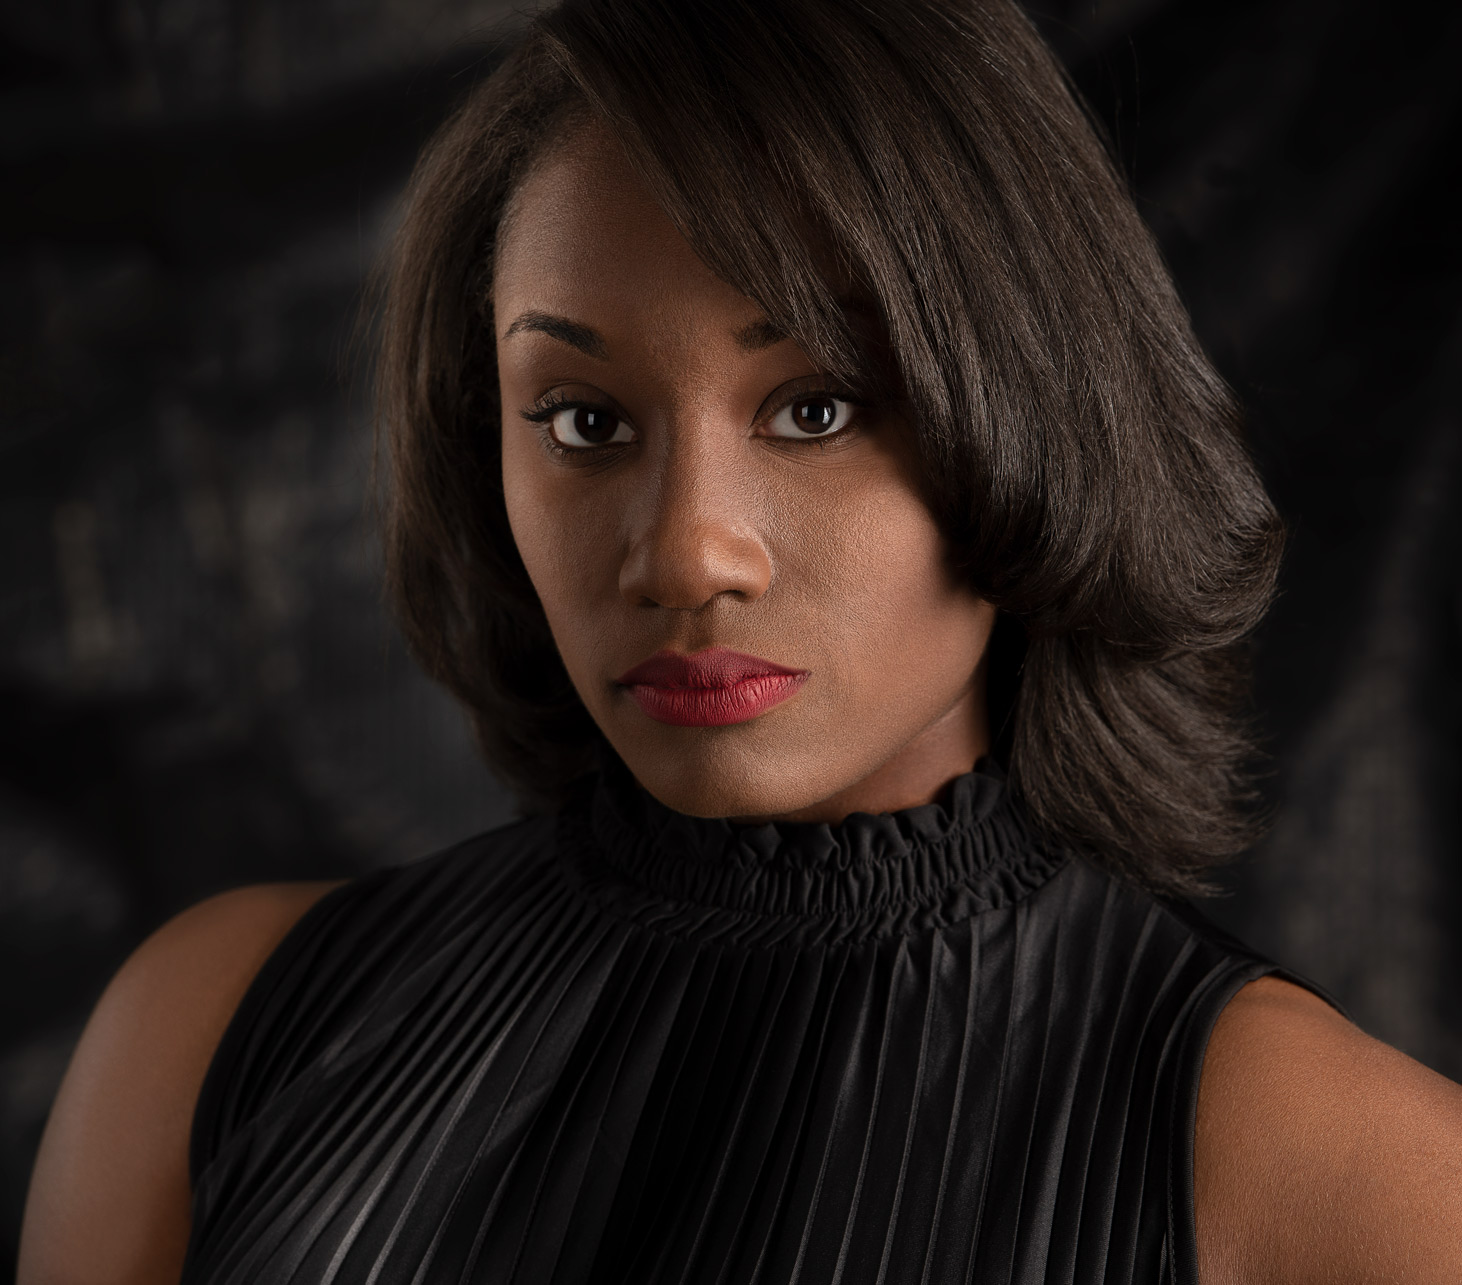 headshot of african american model actress